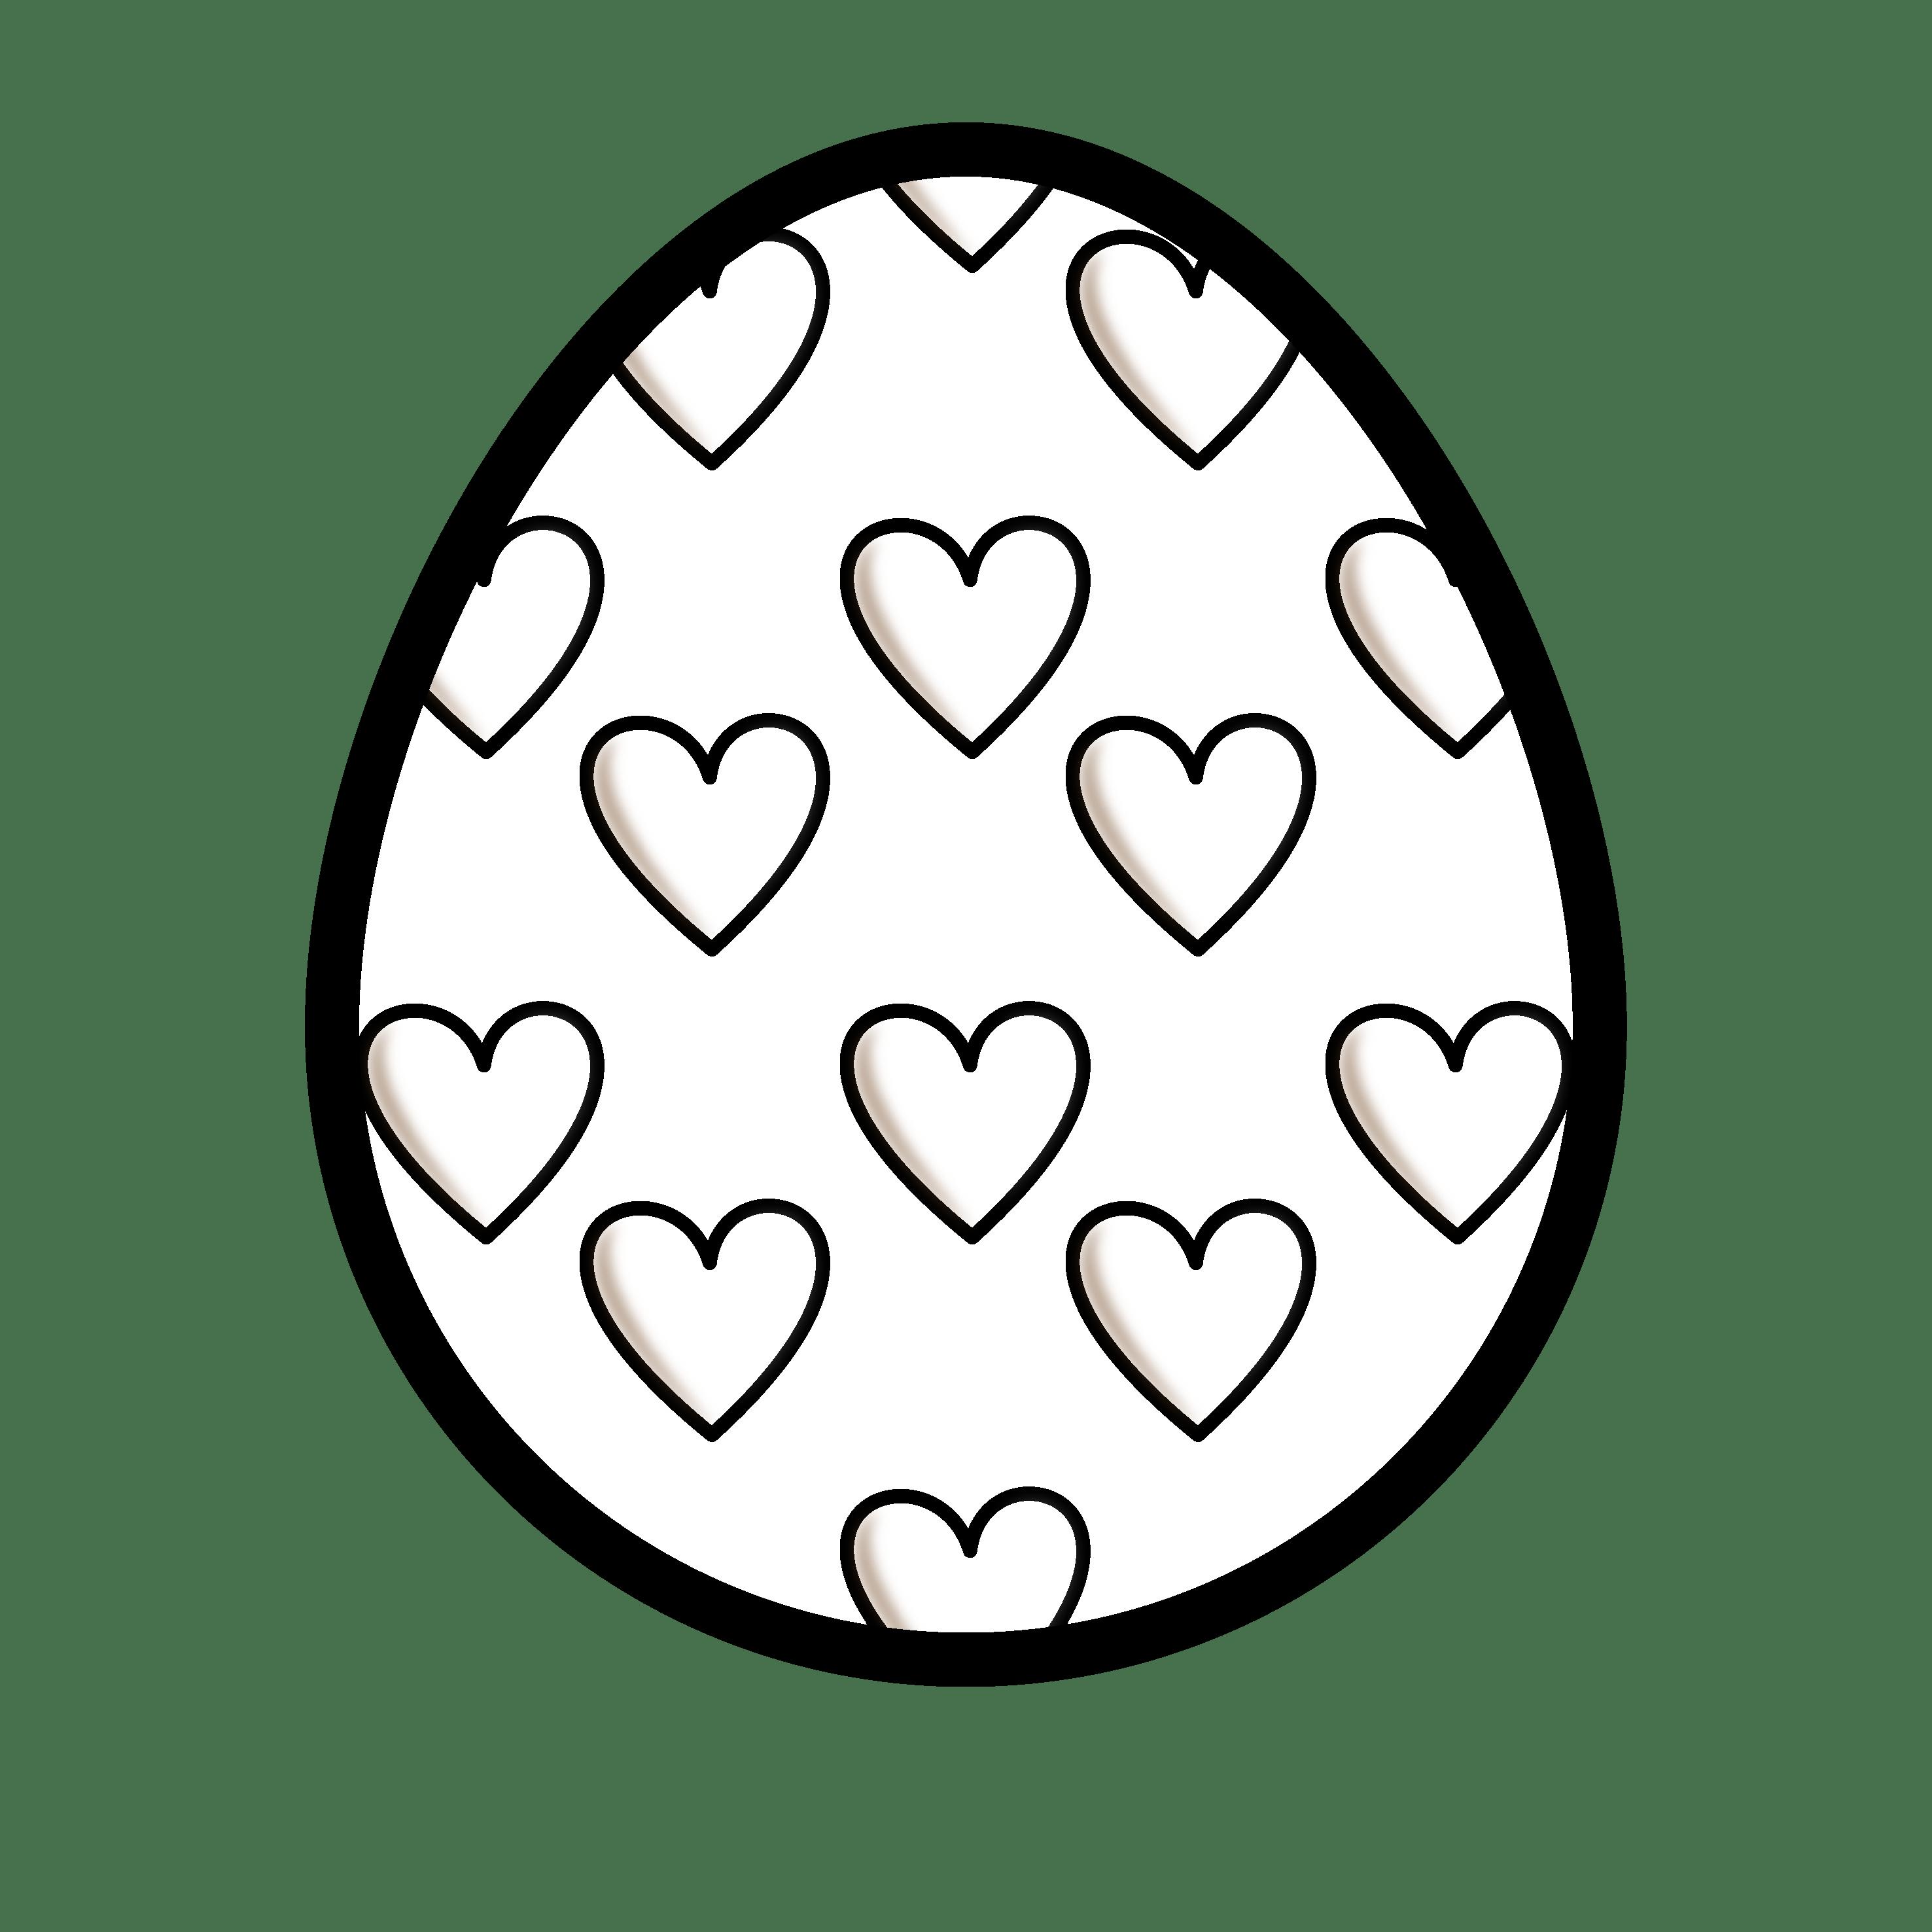 Easter egg hunt clipart black and white image library stock Easter Egg Clipart Group (57+) image library stock